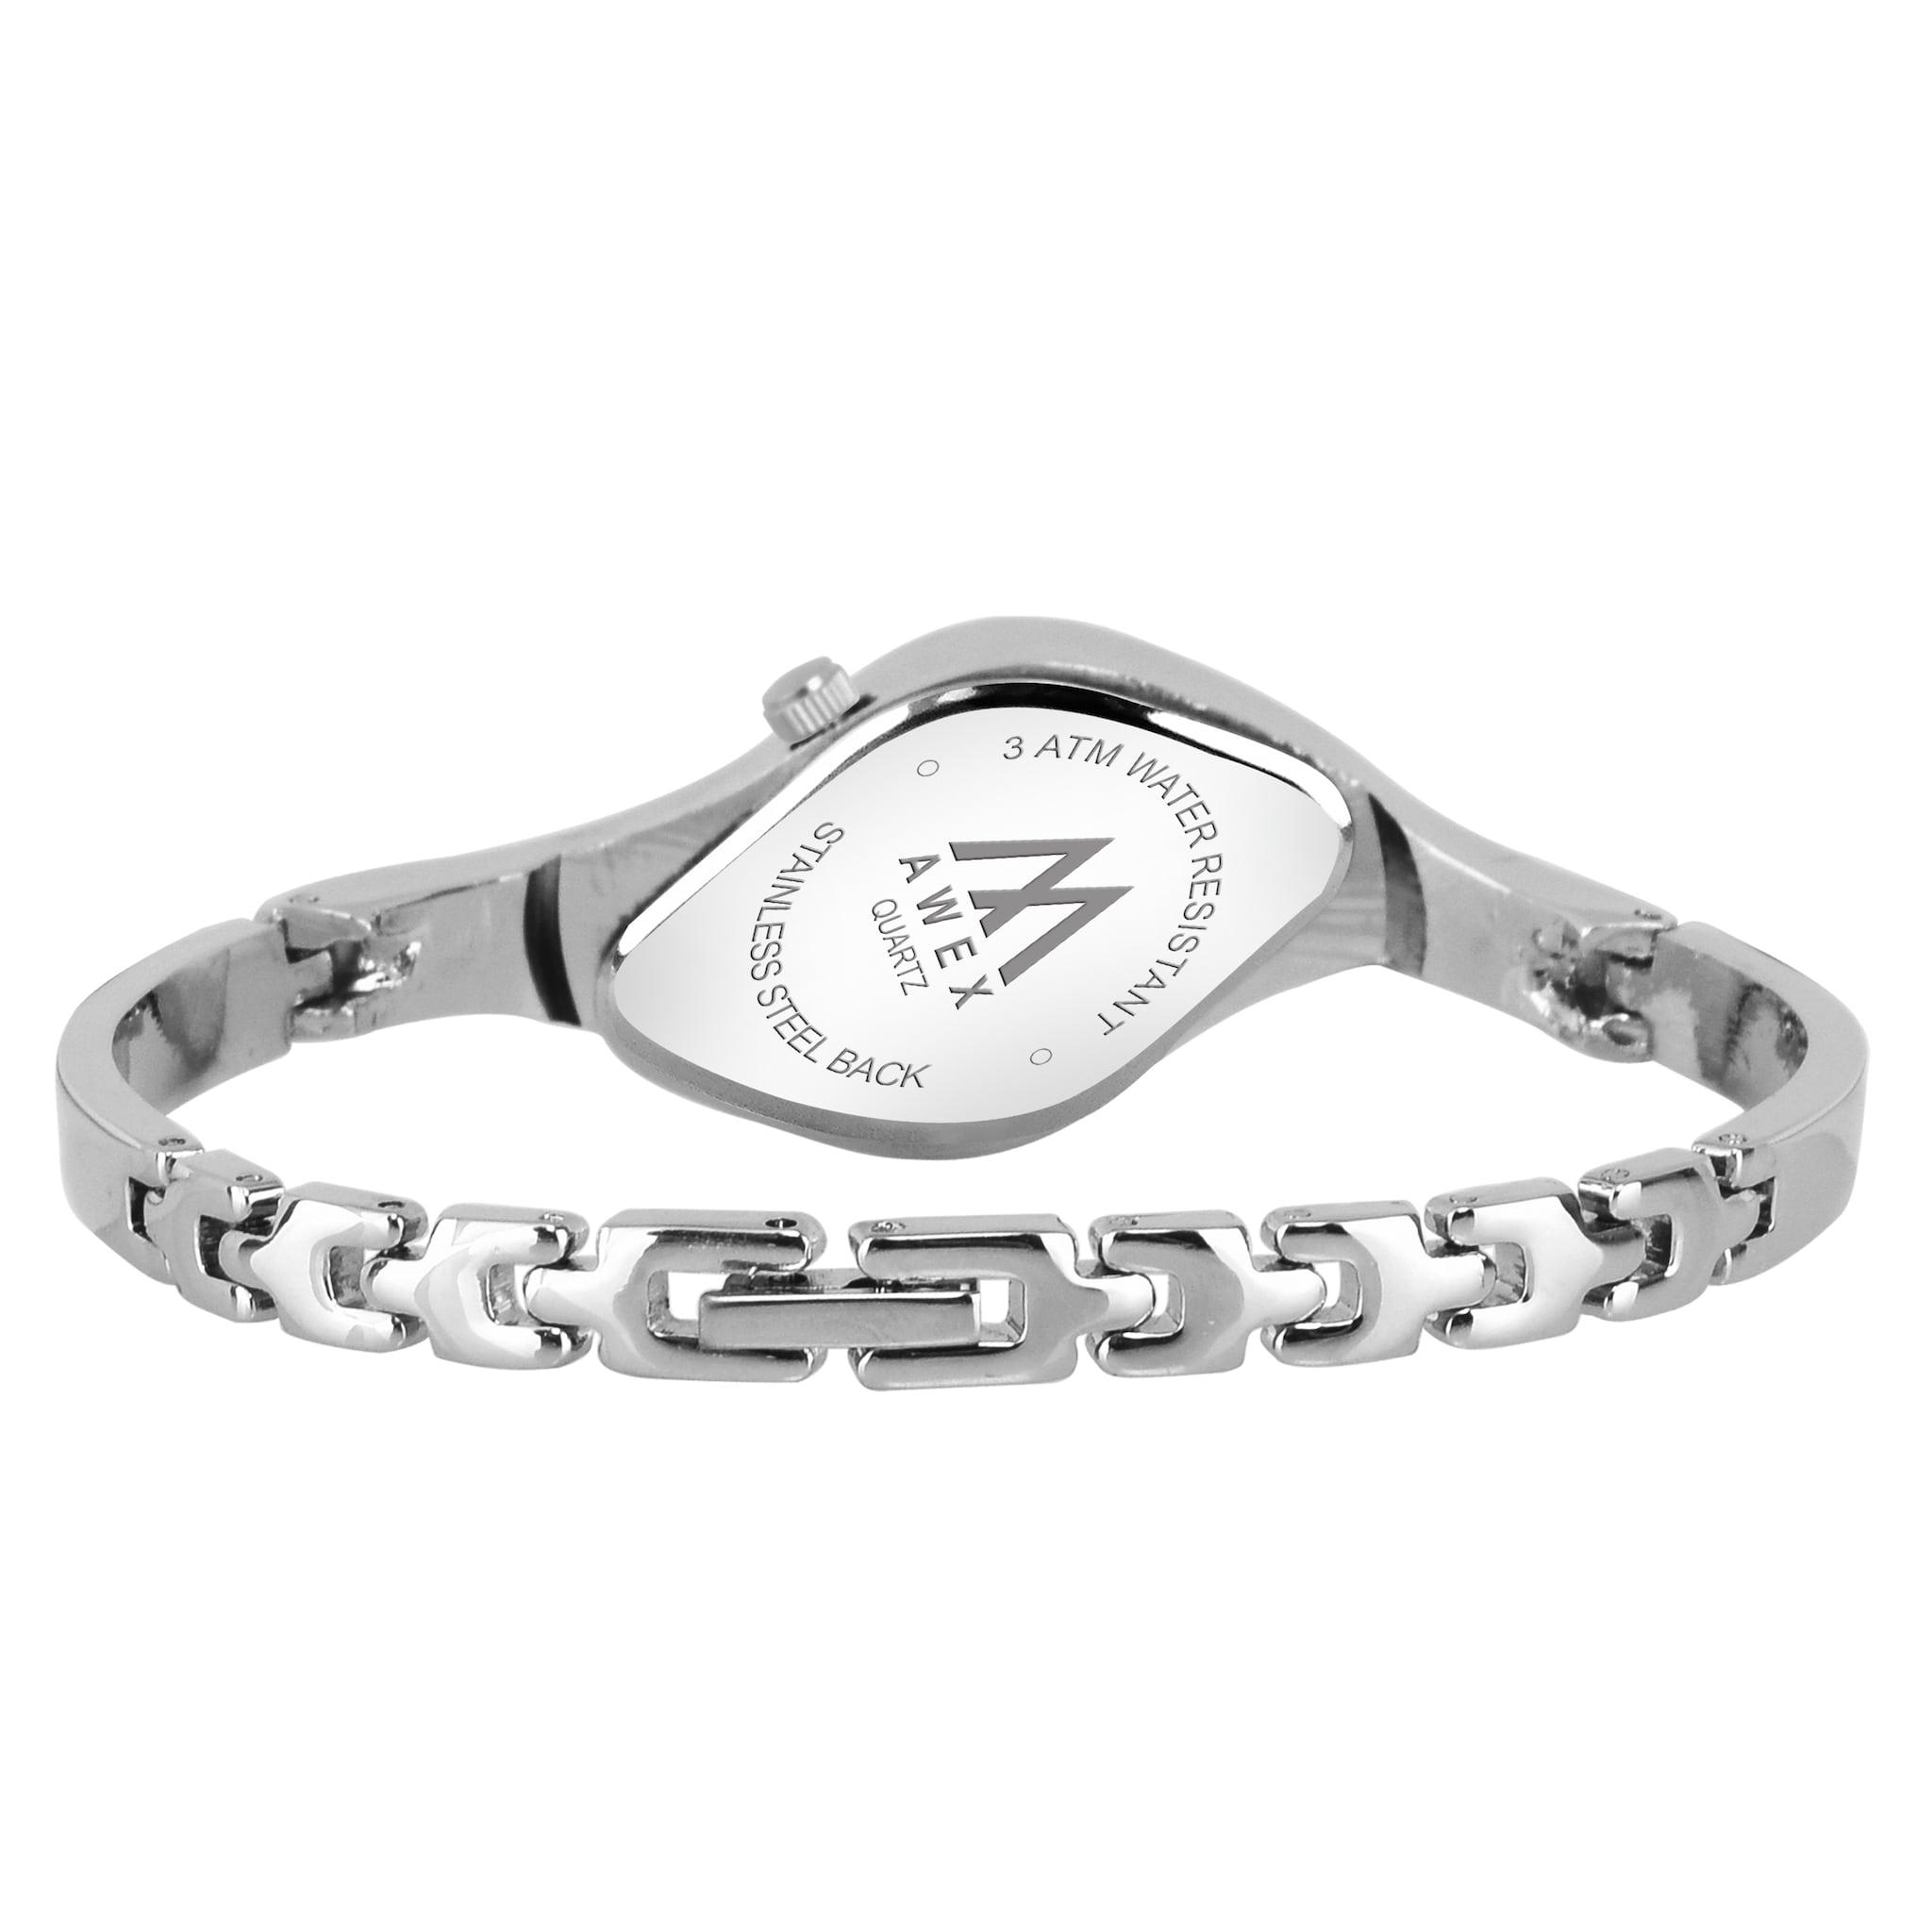 Awex Silver Sky Oval Silver Strap Analog Watch - For Women